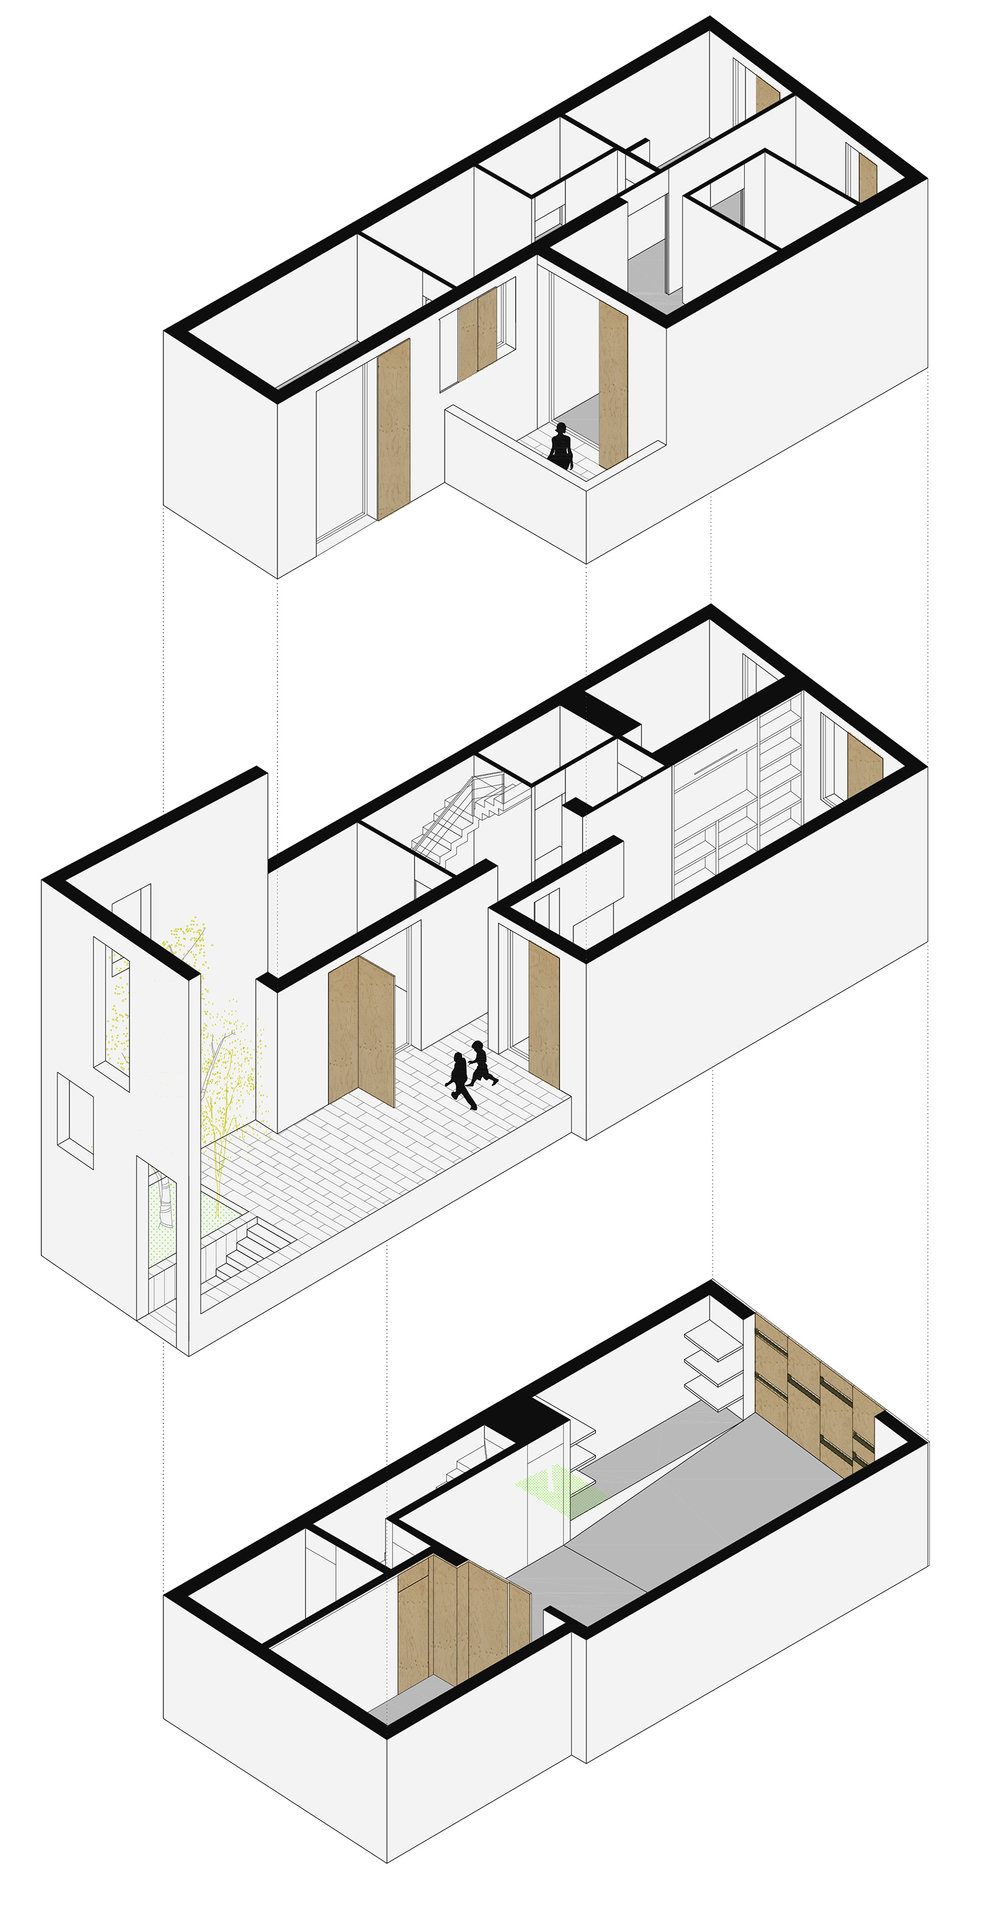 arquitectura moderna Caceres ramiro losada amor alberto garcia 015.jpg